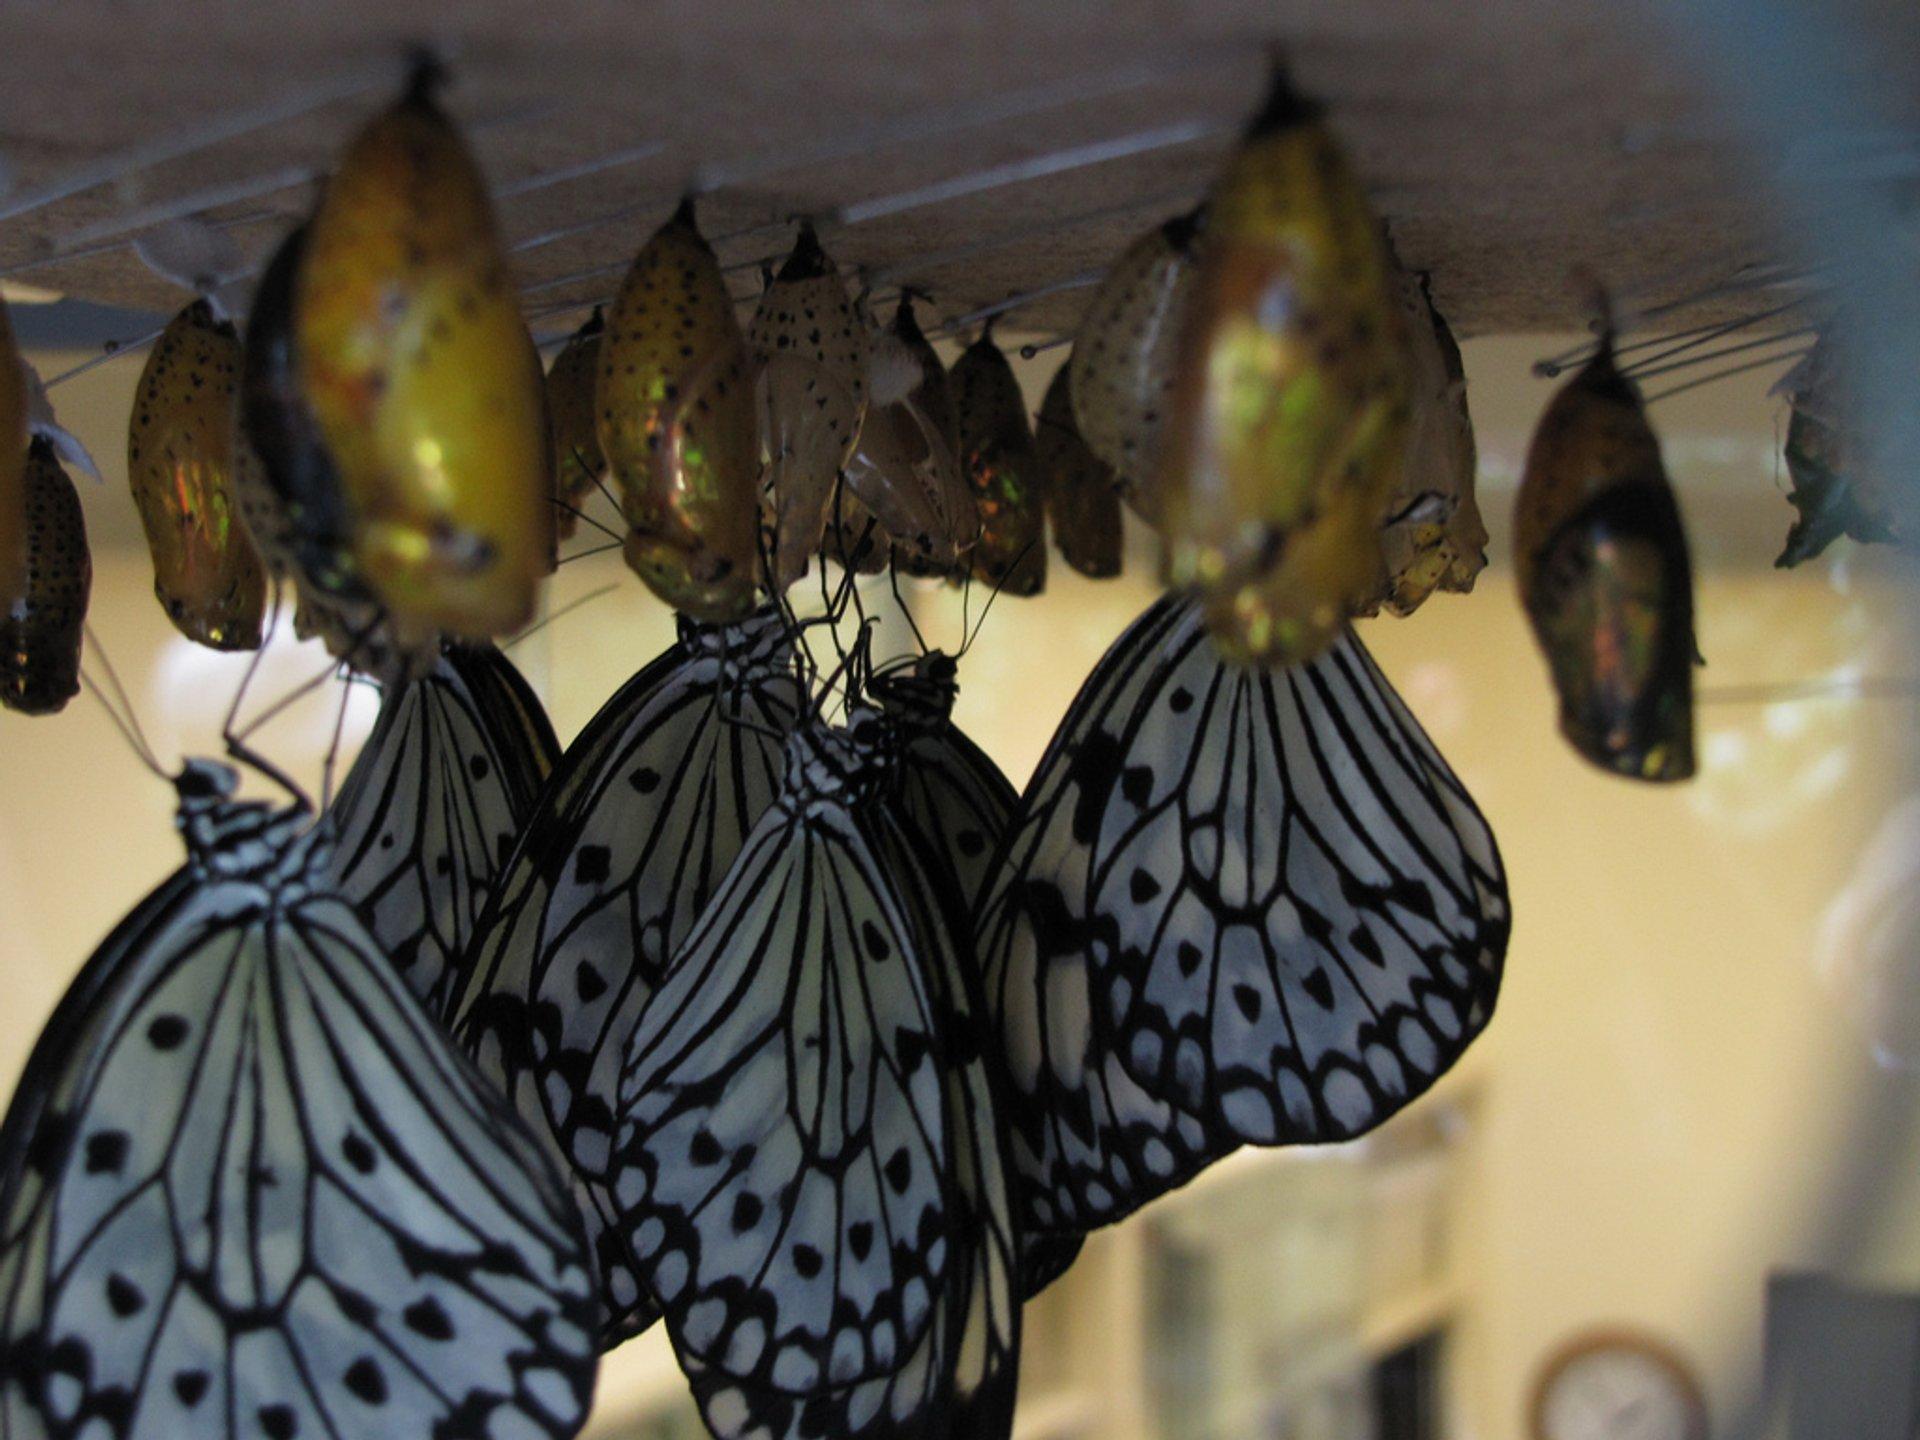 Butterfly Conservatory in Niagara Falls - Best Season 2020